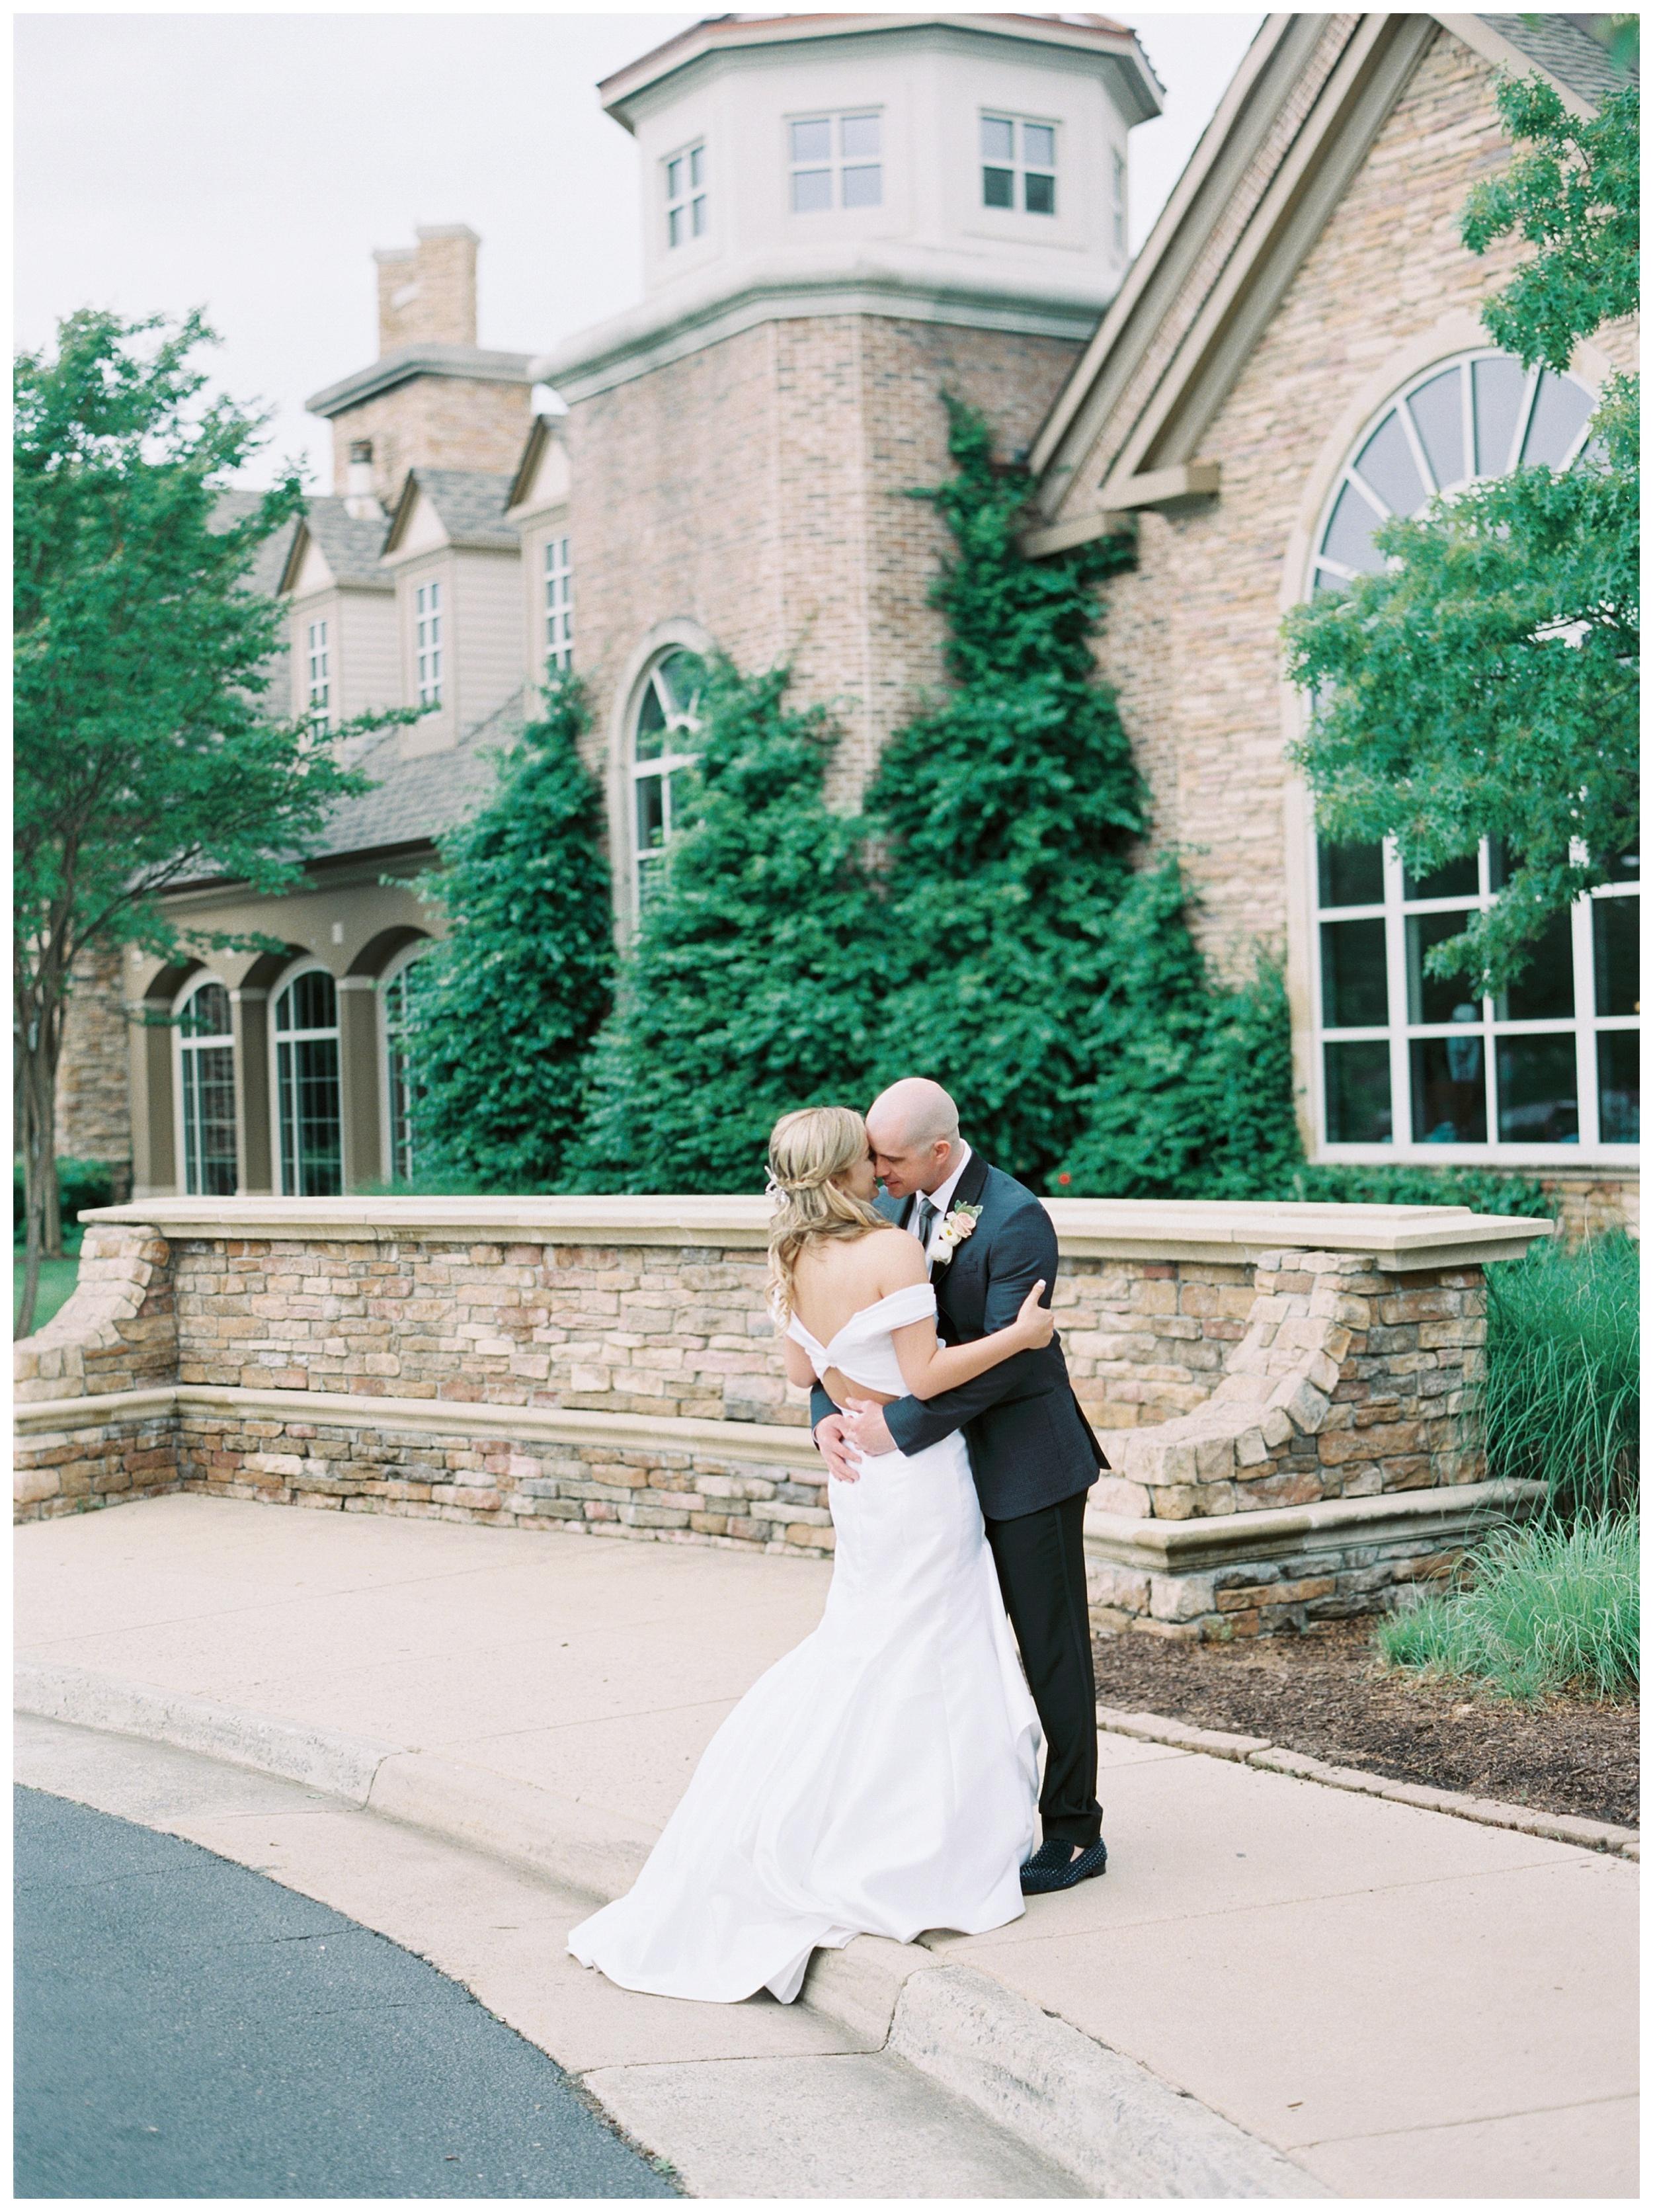 Lansdowne Resort Wedding | Virginia Film Wedding Photographer Kir Tuben_0001.jpg